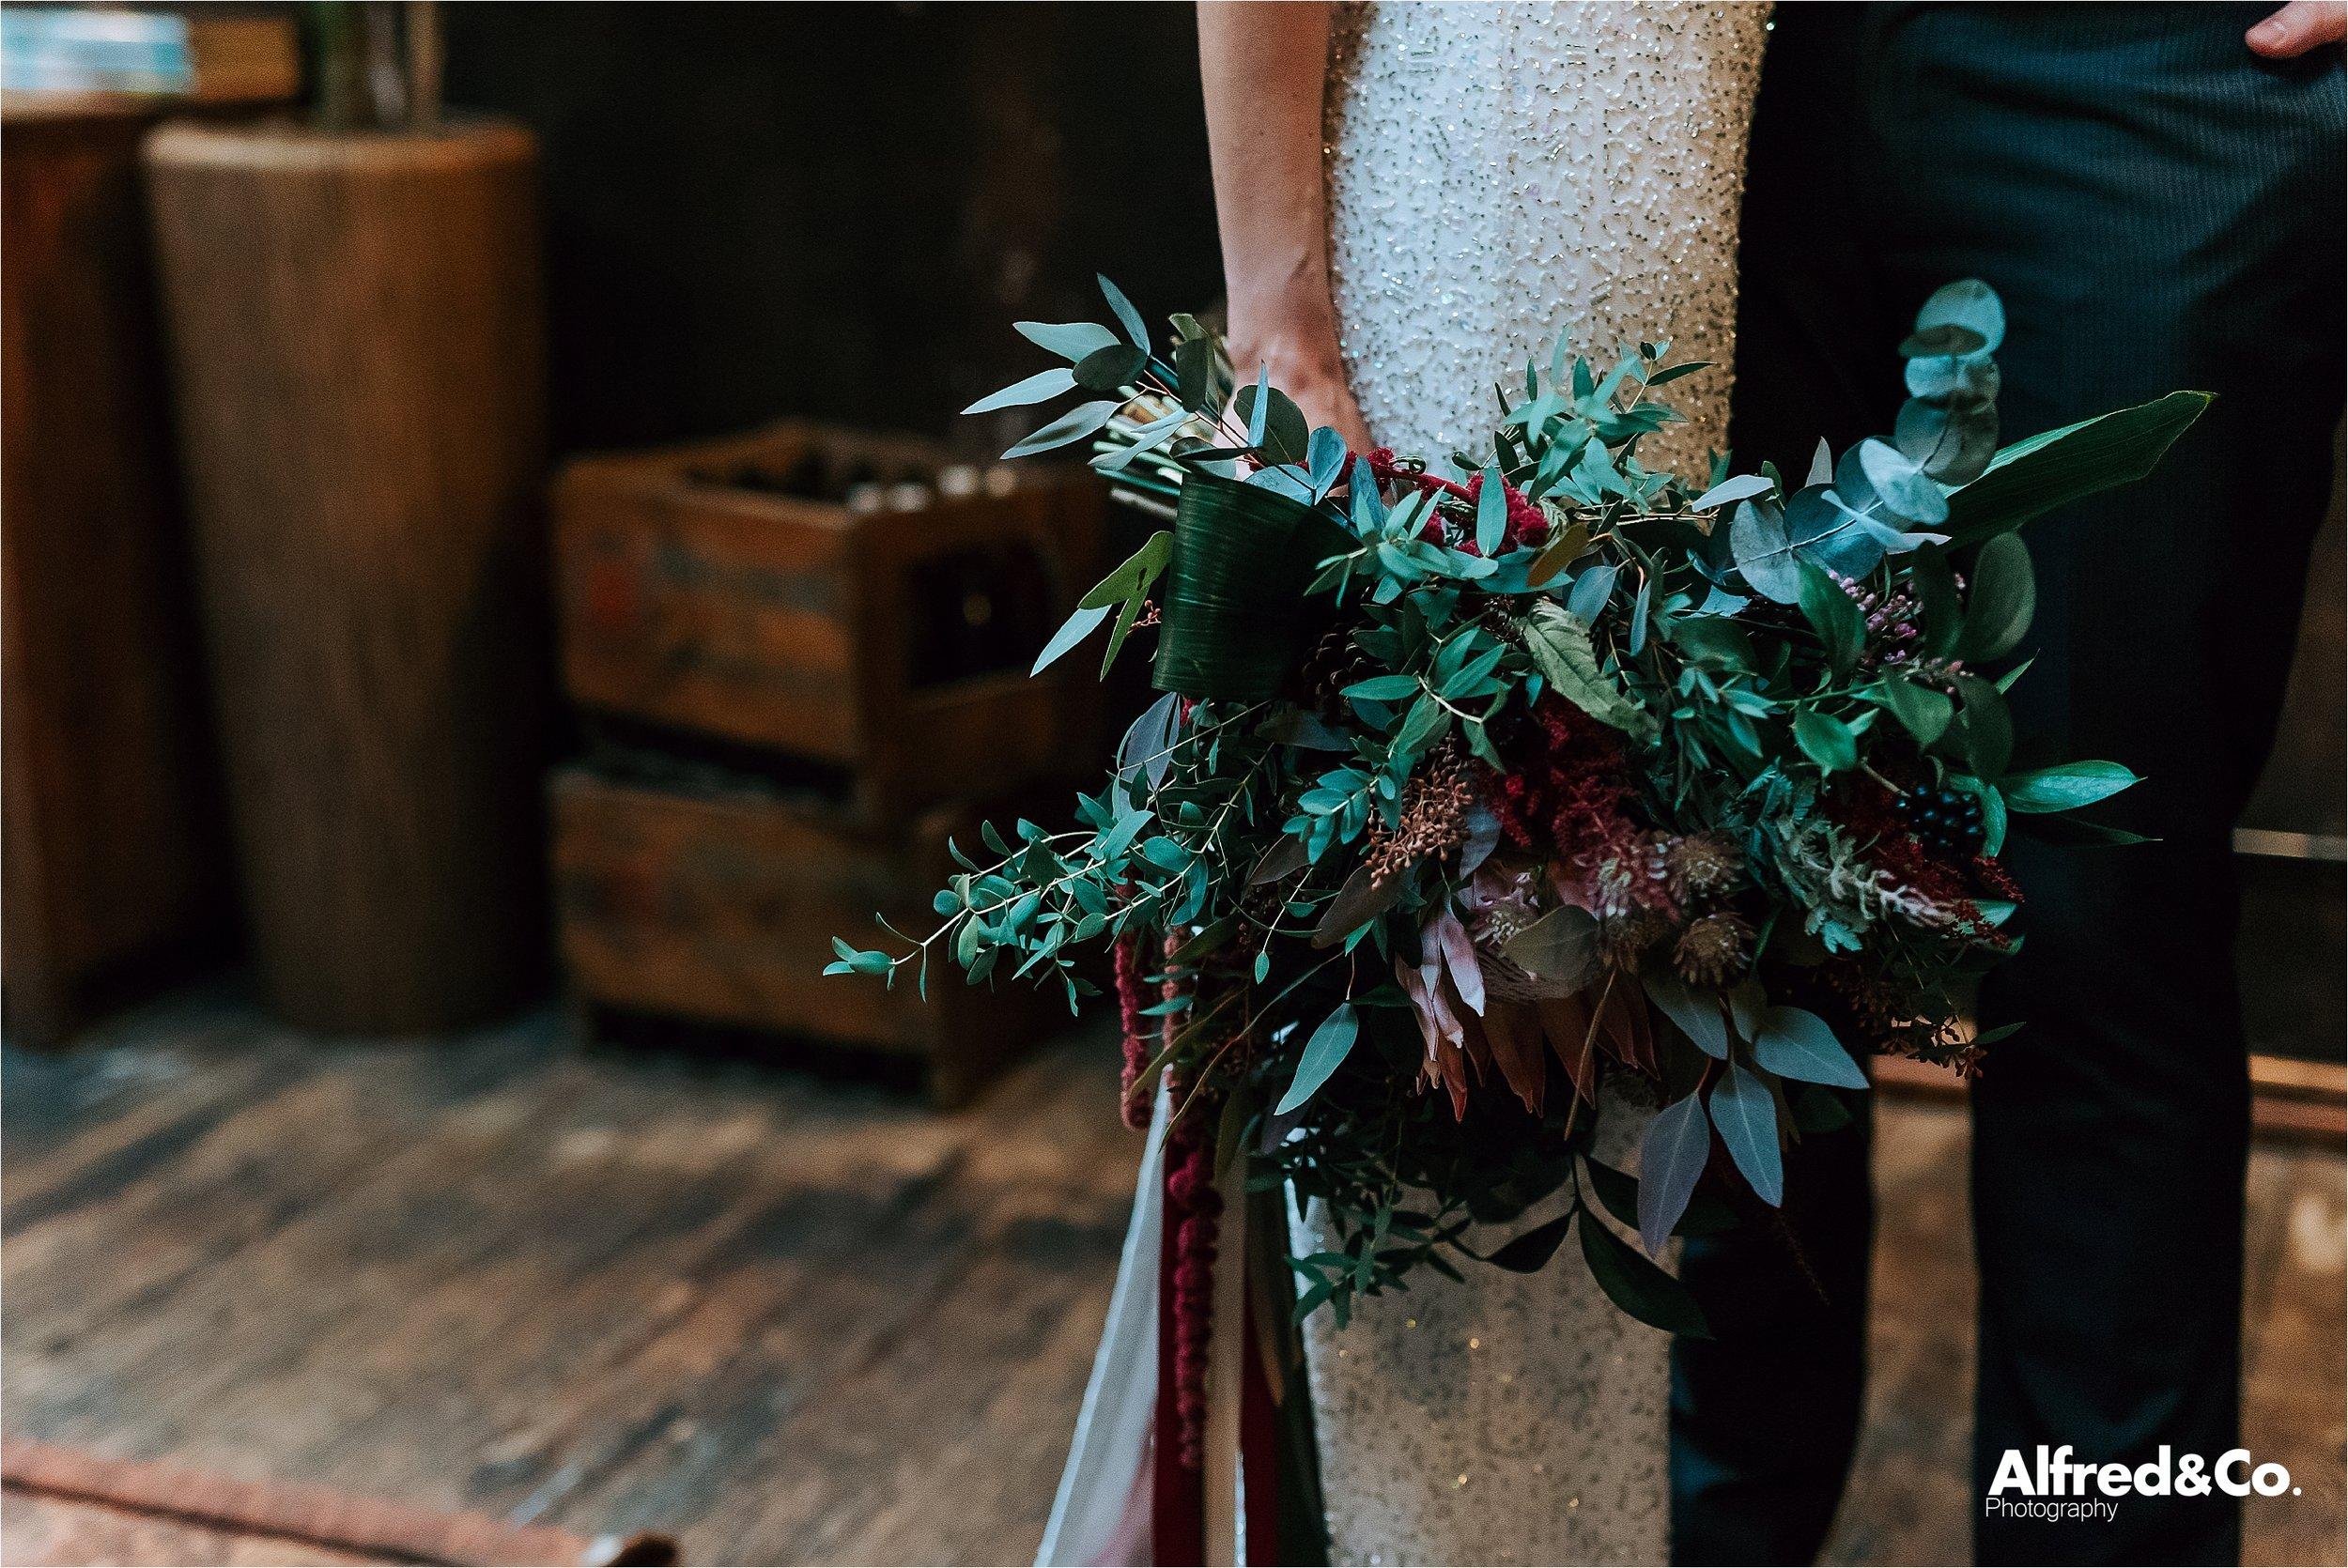 holmesmill+wedding+clitheroe+photographer+rustic+lancashire36.jpg